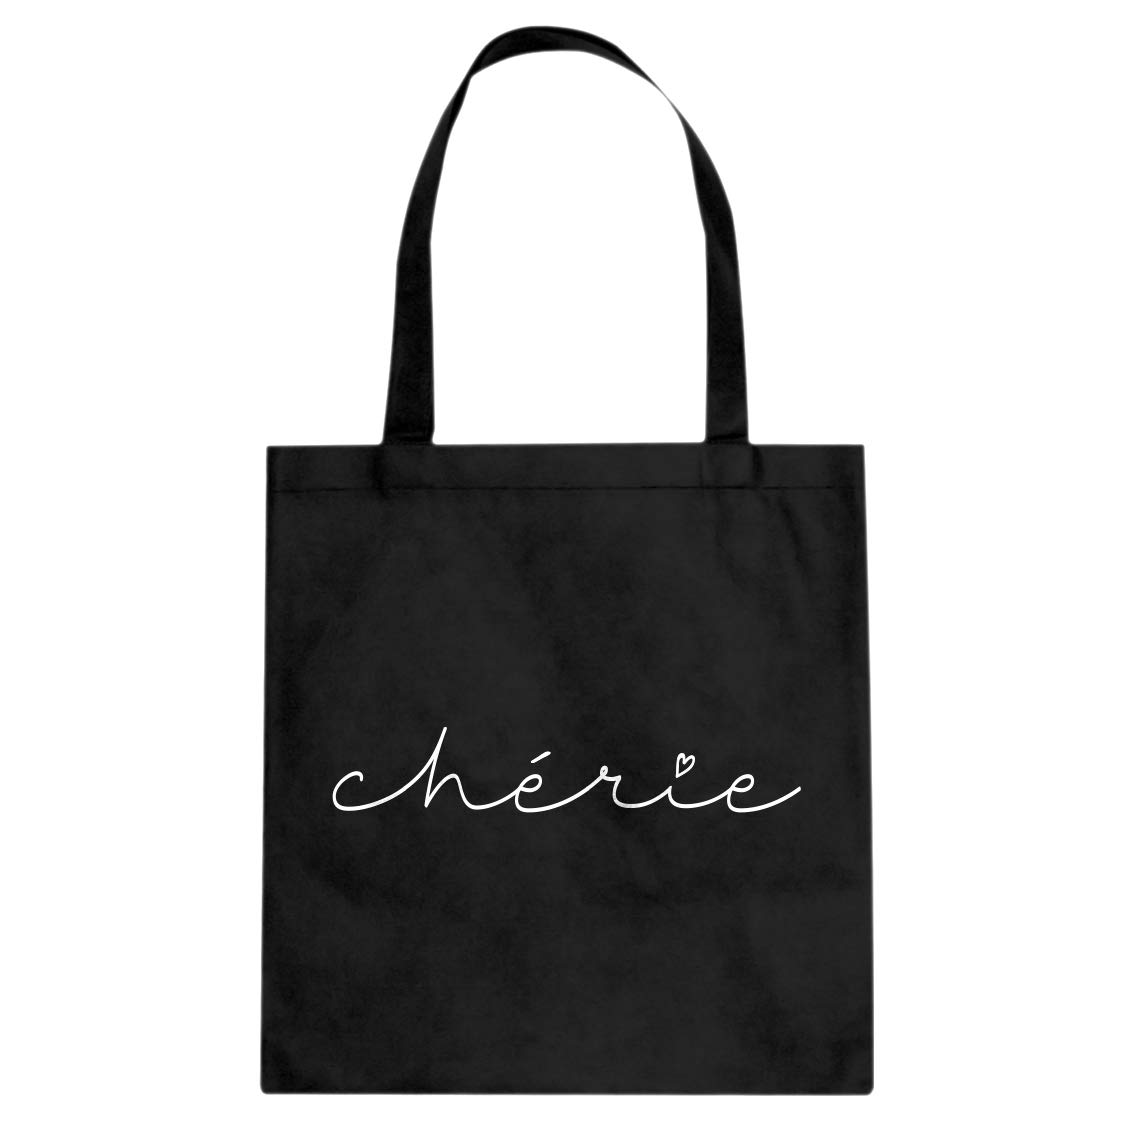 Indica Plateau Cherie Cotton Canvas Tote Bag